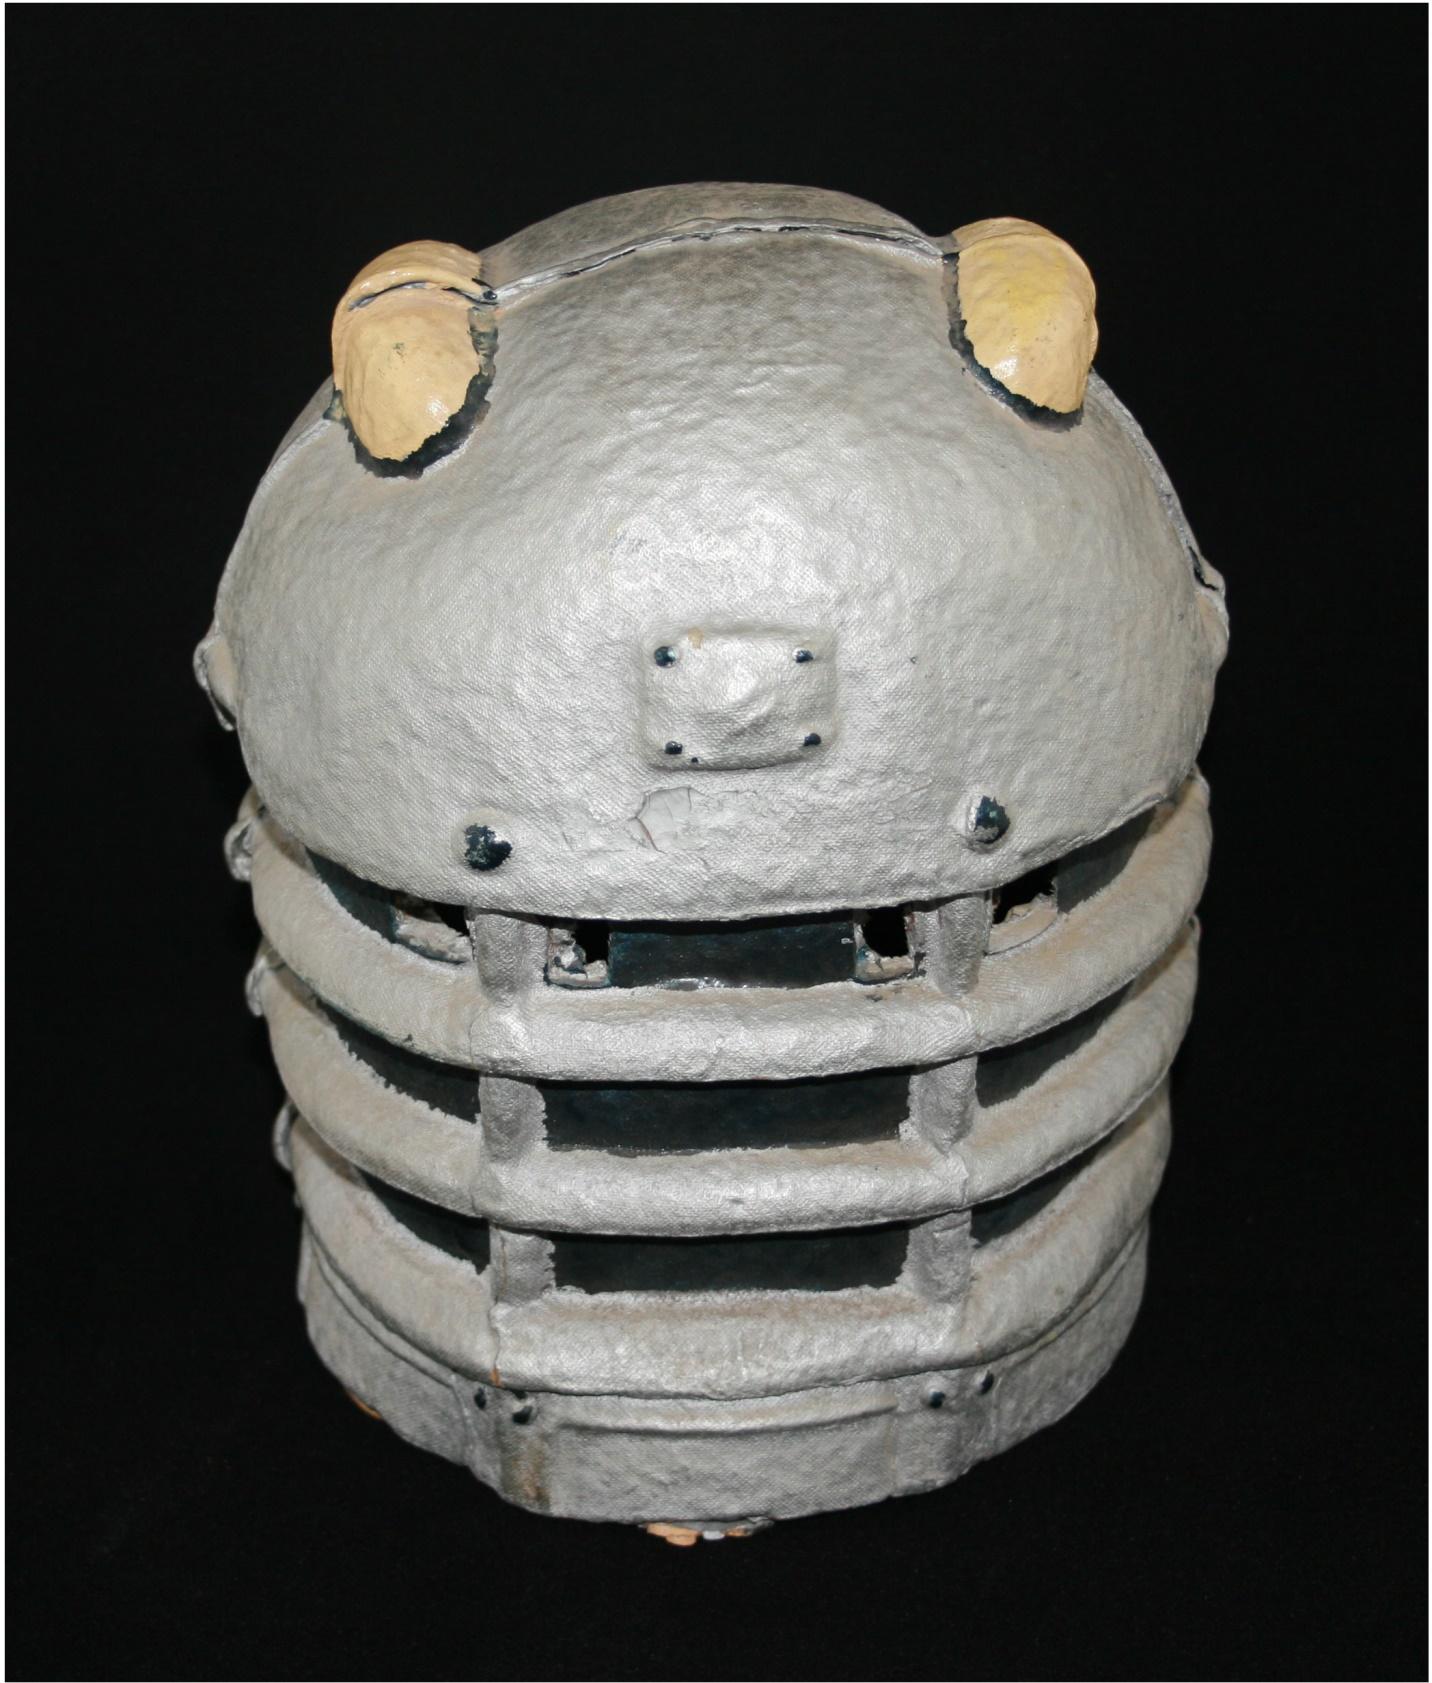 A. E. Bangham & Co. Ltd., Dalek papier-mache mask